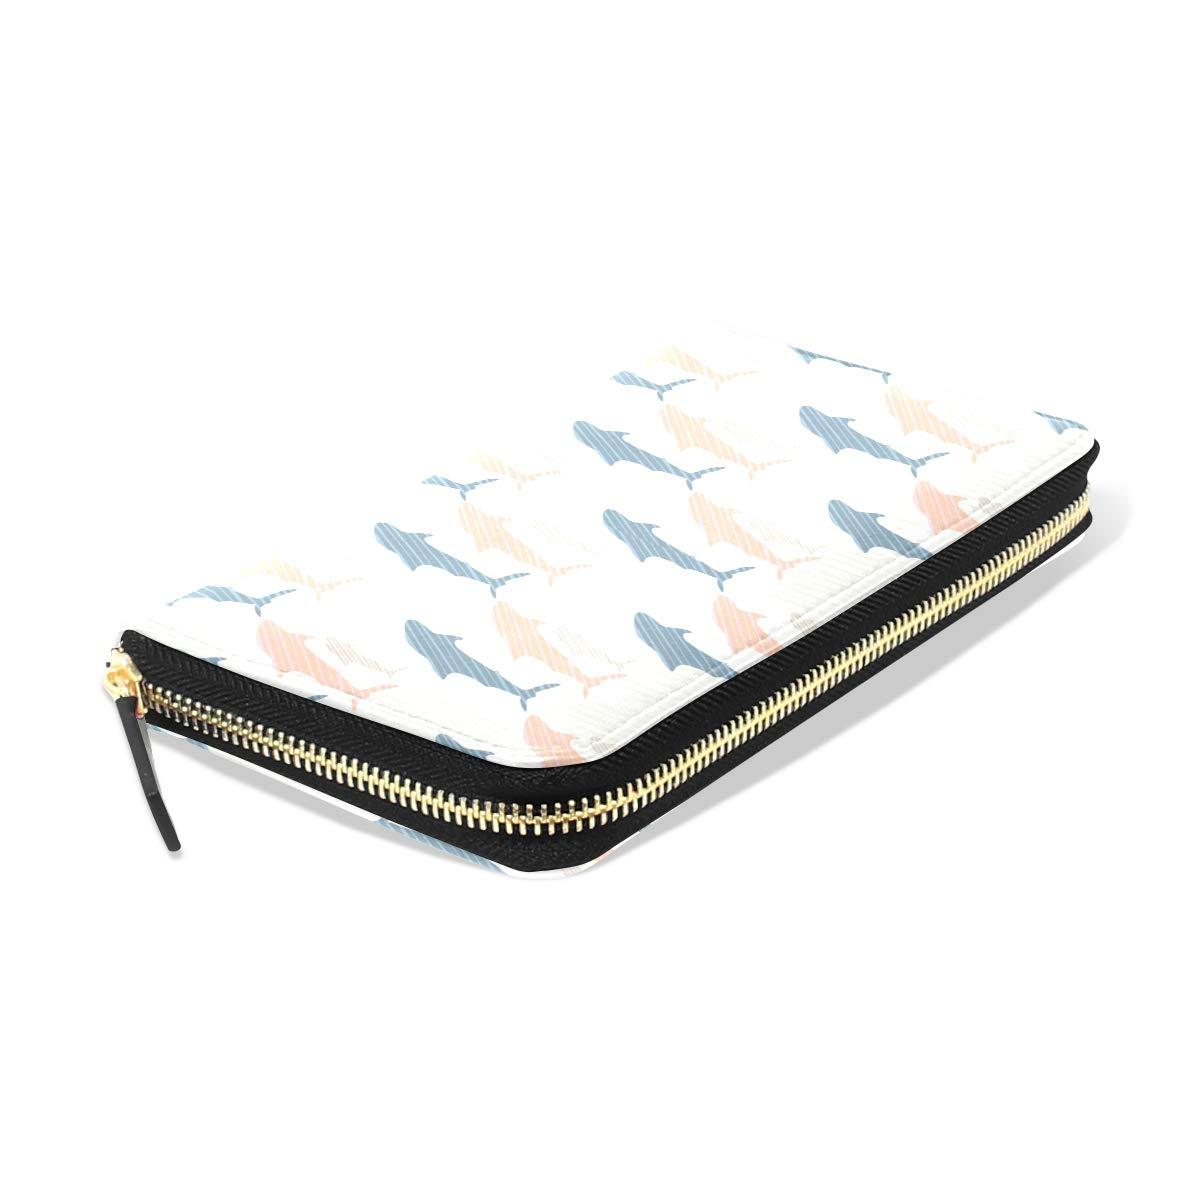 Women Whale Shark Mini Art Leather Wallet Large Capacity Zipper Travel Wristlet Bags Clutch Cellphone Bag